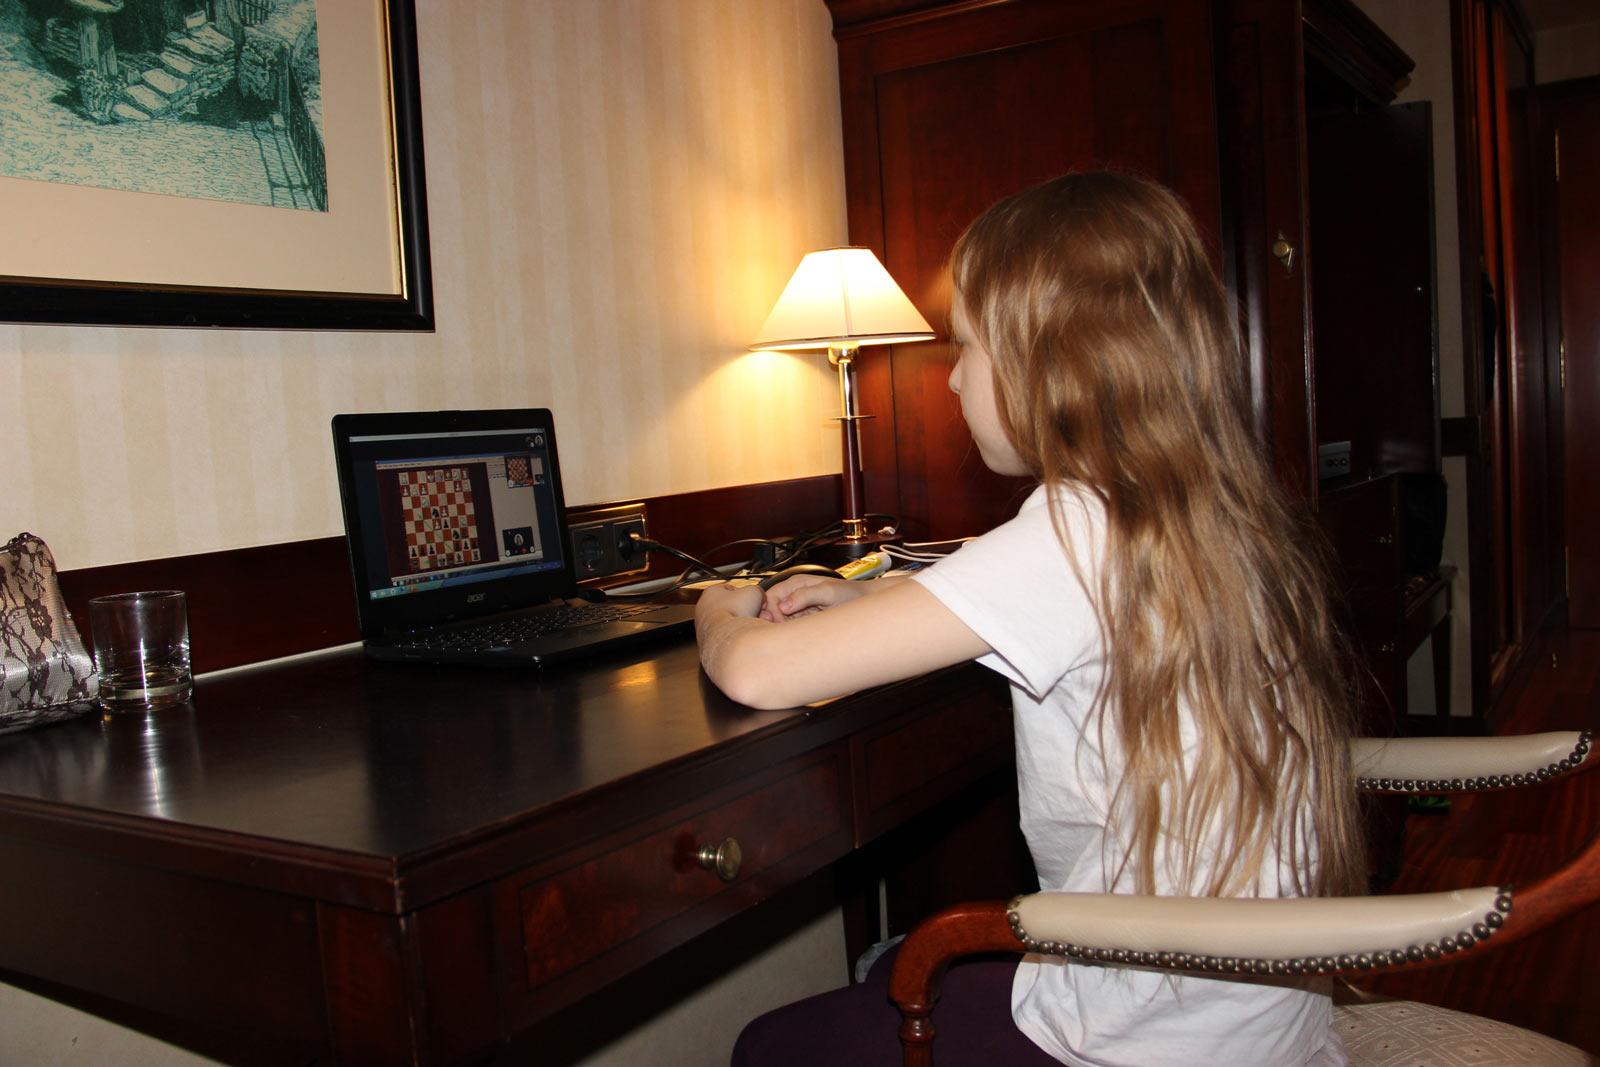 Шахматистка Вероника Юдина заводит партию в компьютер